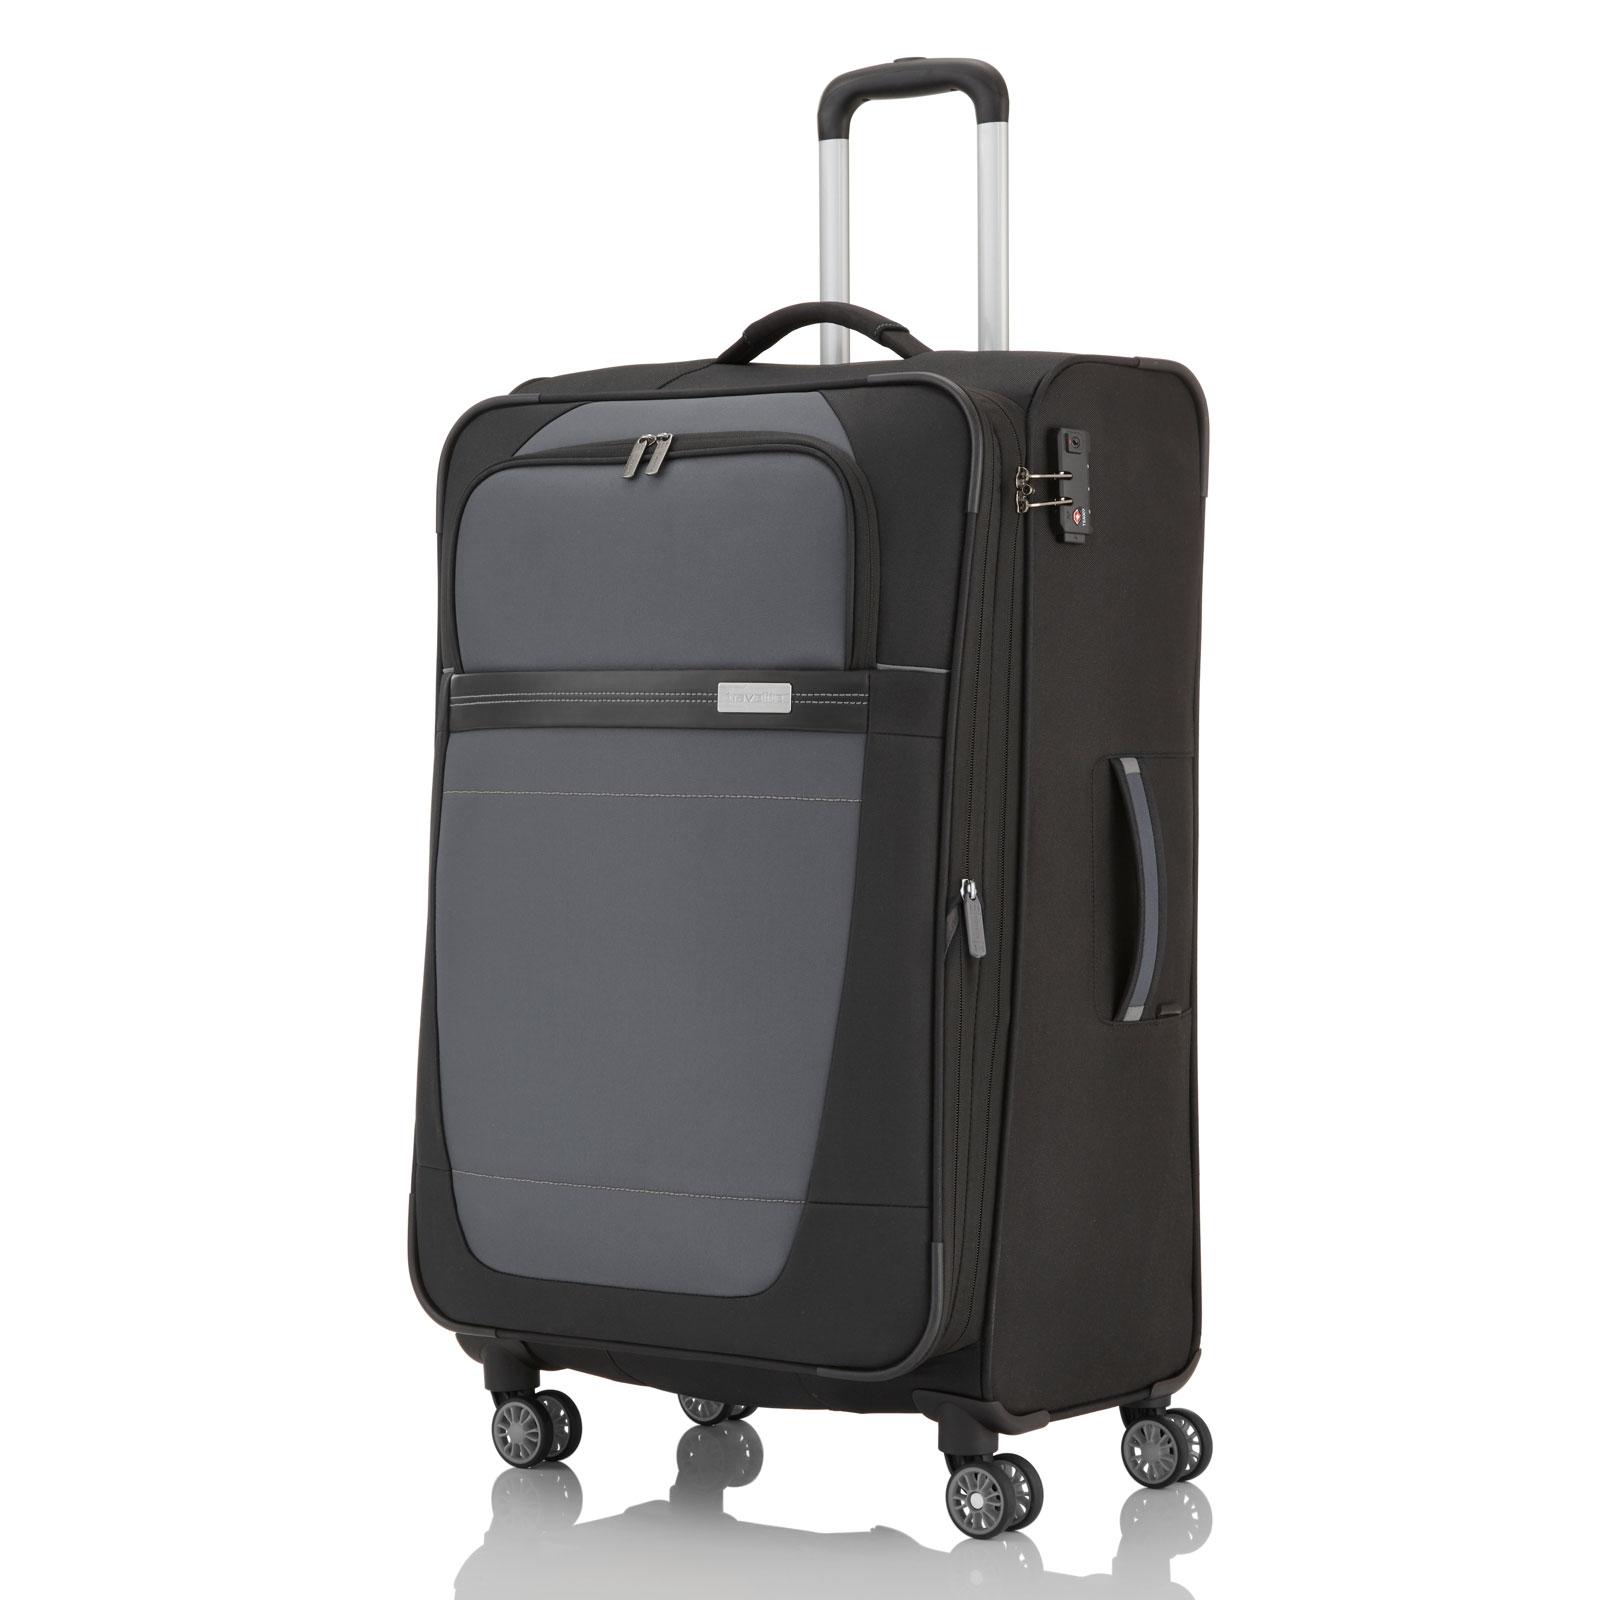 travelite meteor trolley 66 cm 4 rollen g nstig kaufen. Black Bedroom Furniture Sets. Home Design Ideas